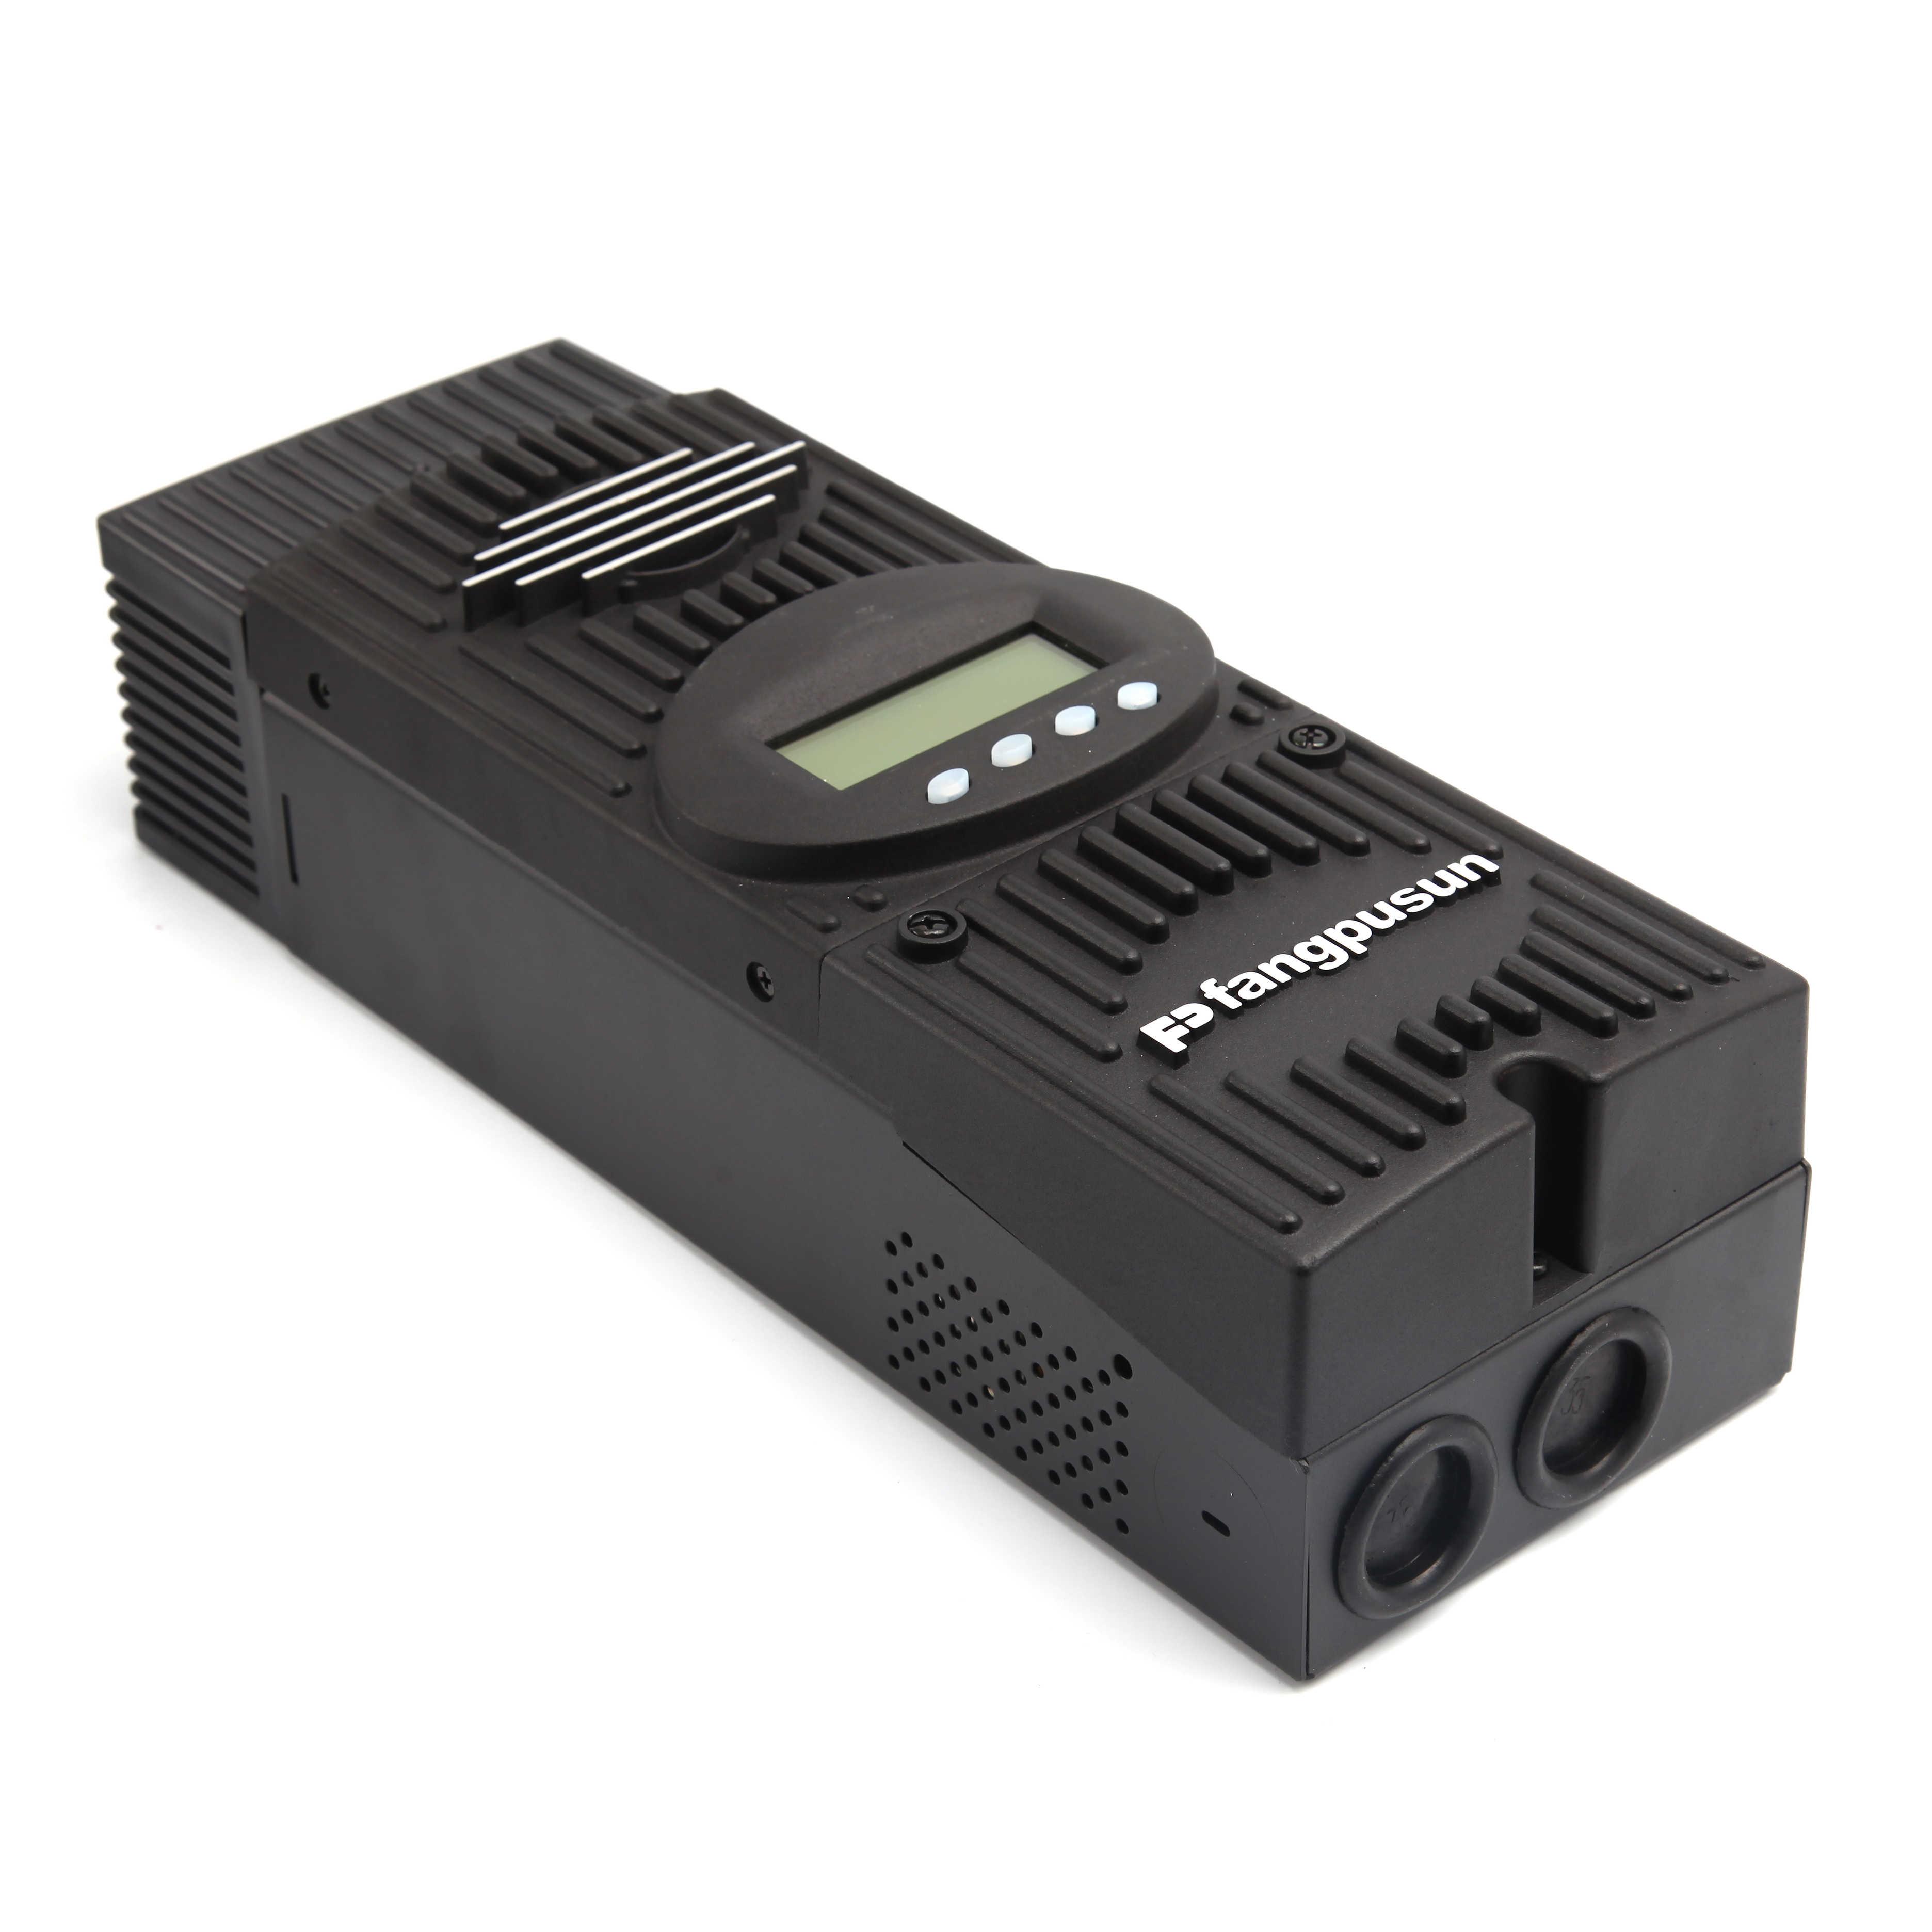 Fangpusun Mppt 80a 60a Flexmax Regulator Outback 80 Amp Solar Charge Controller Tool Parts Aliexpress